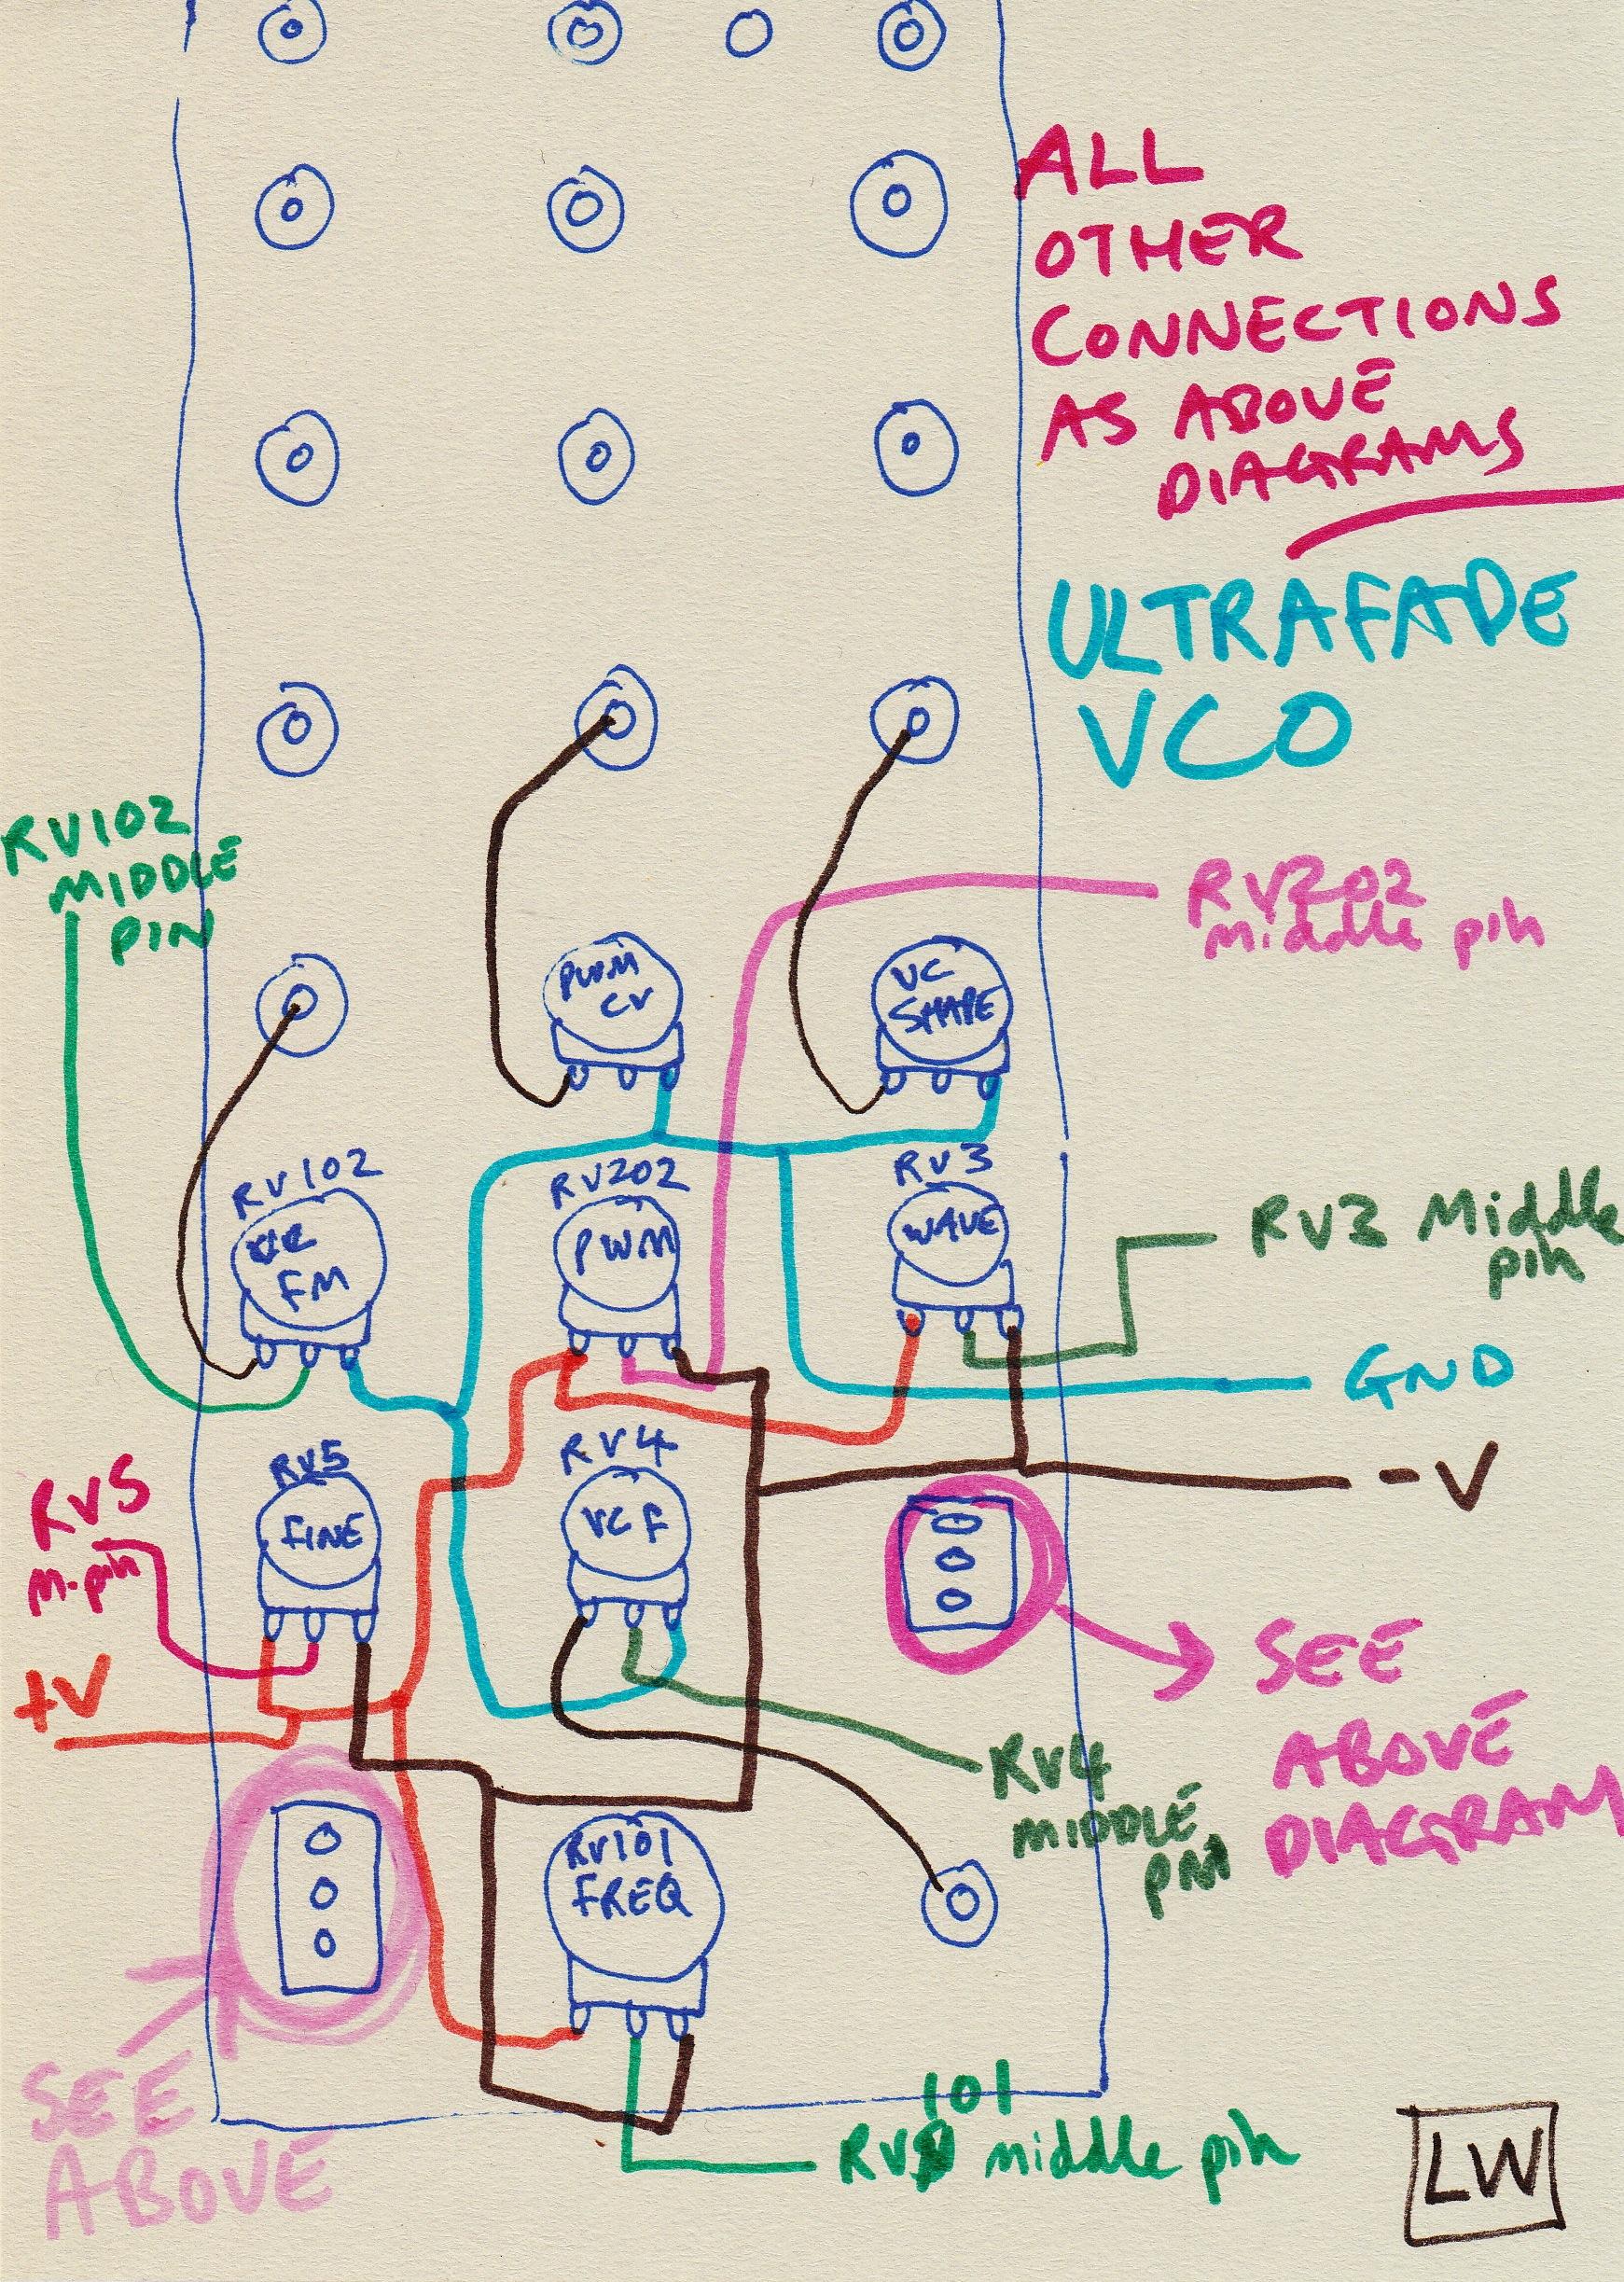 stroh-ultrafade-wiring-diagram-3-inch